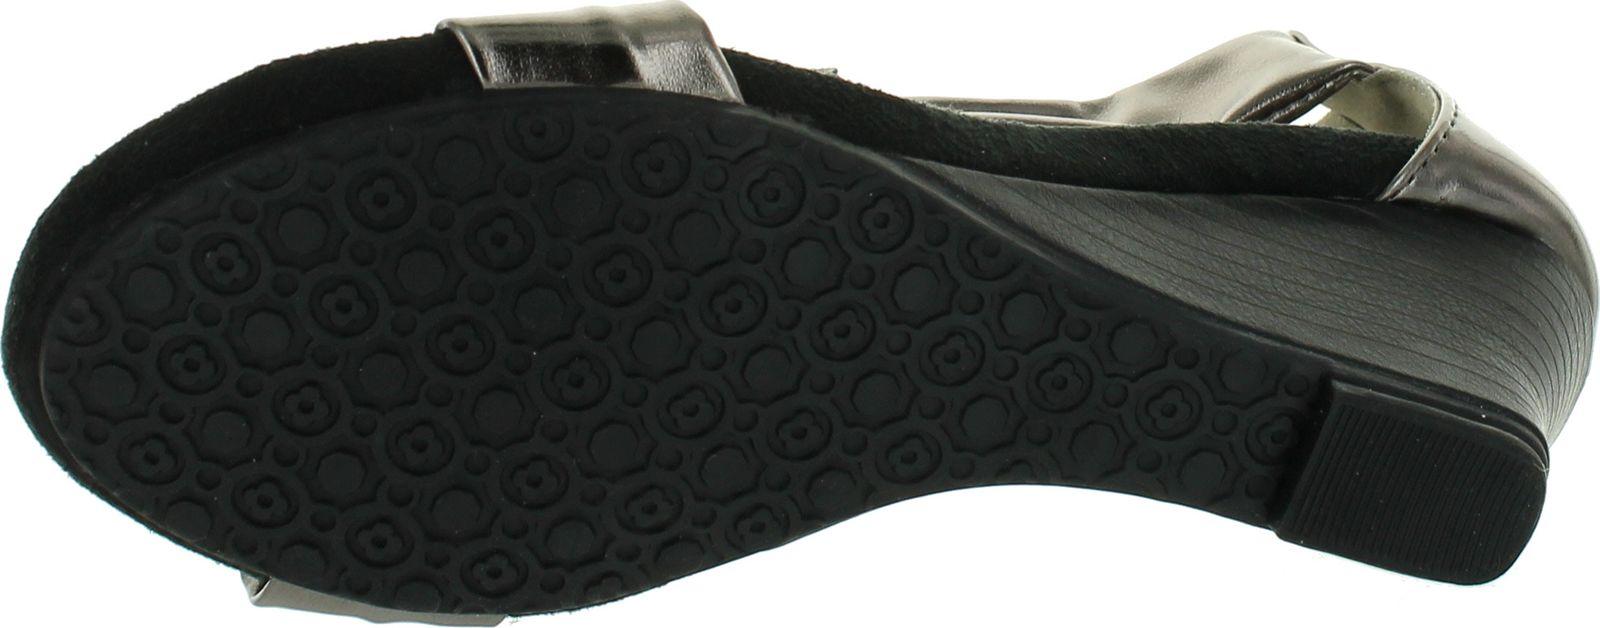 thumbnail 12 - PATRIZIA by Spring Step Womens Harlequin Fashion Wedge Sandals